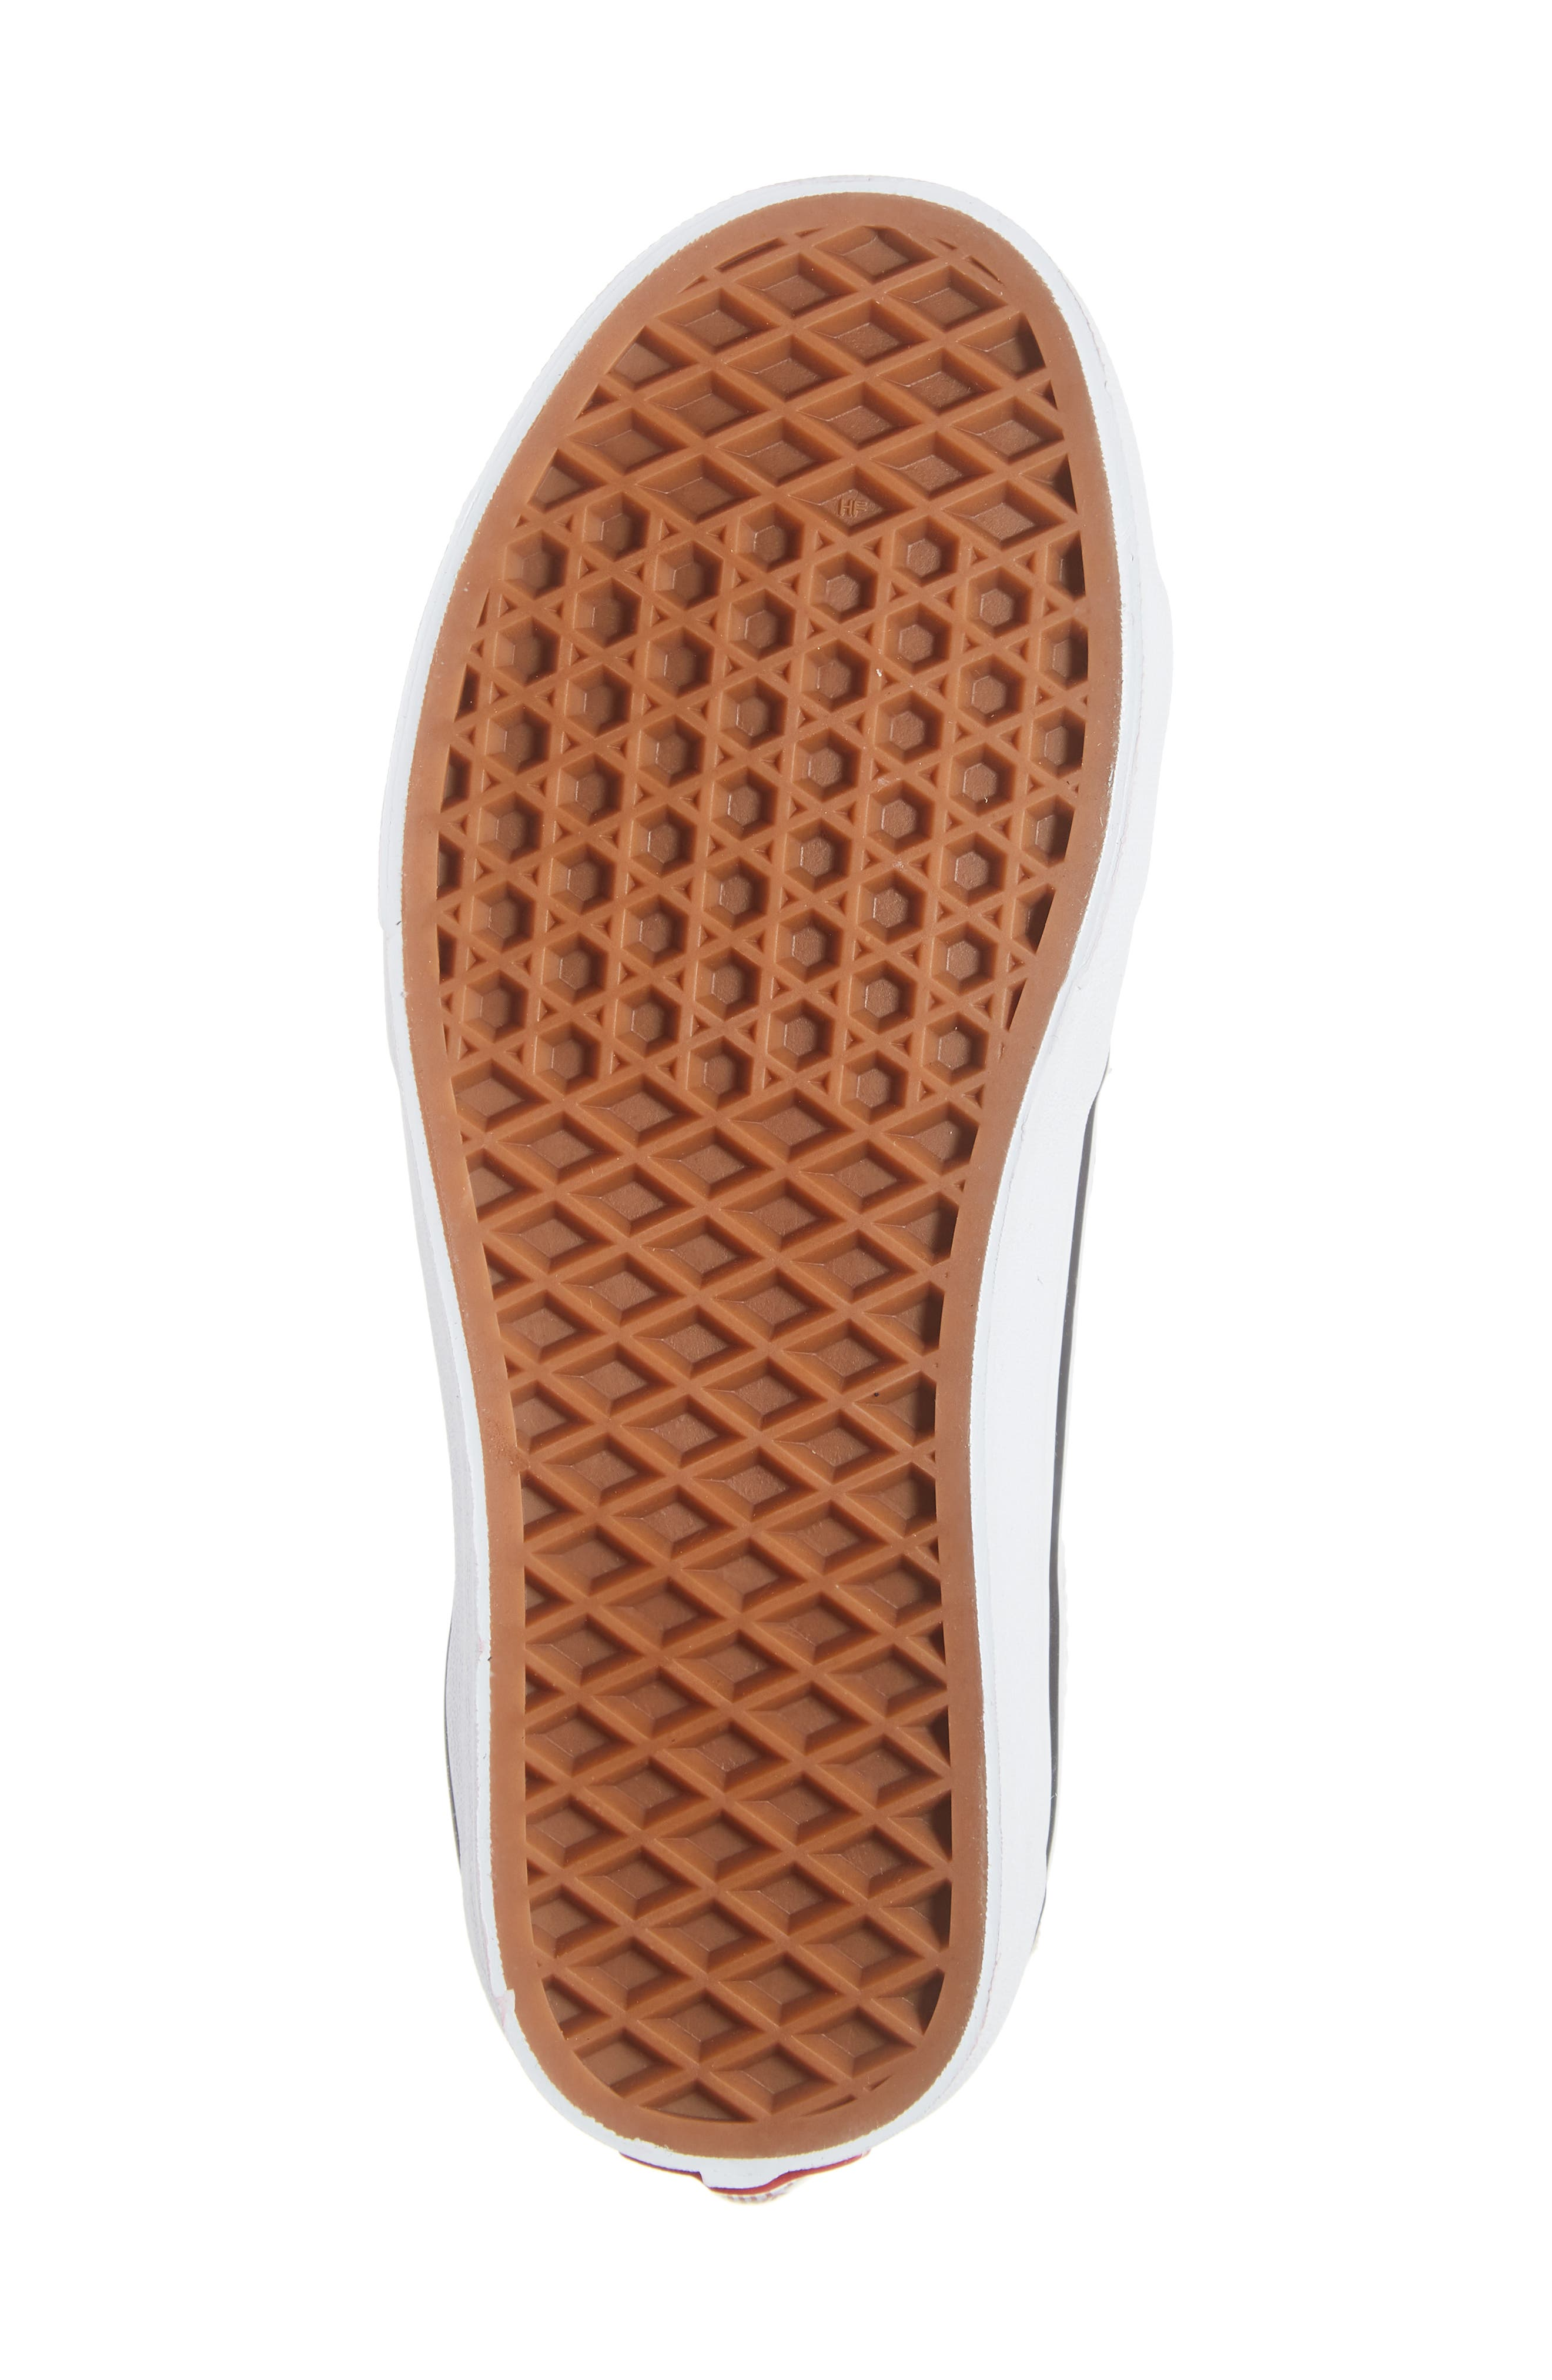 VANS,                             Sk8-Hi Checker Floral High Top Sneaker,                             Alternate thumbnail 6, color,                             CHECKER FLORAL TURTLEDOVE